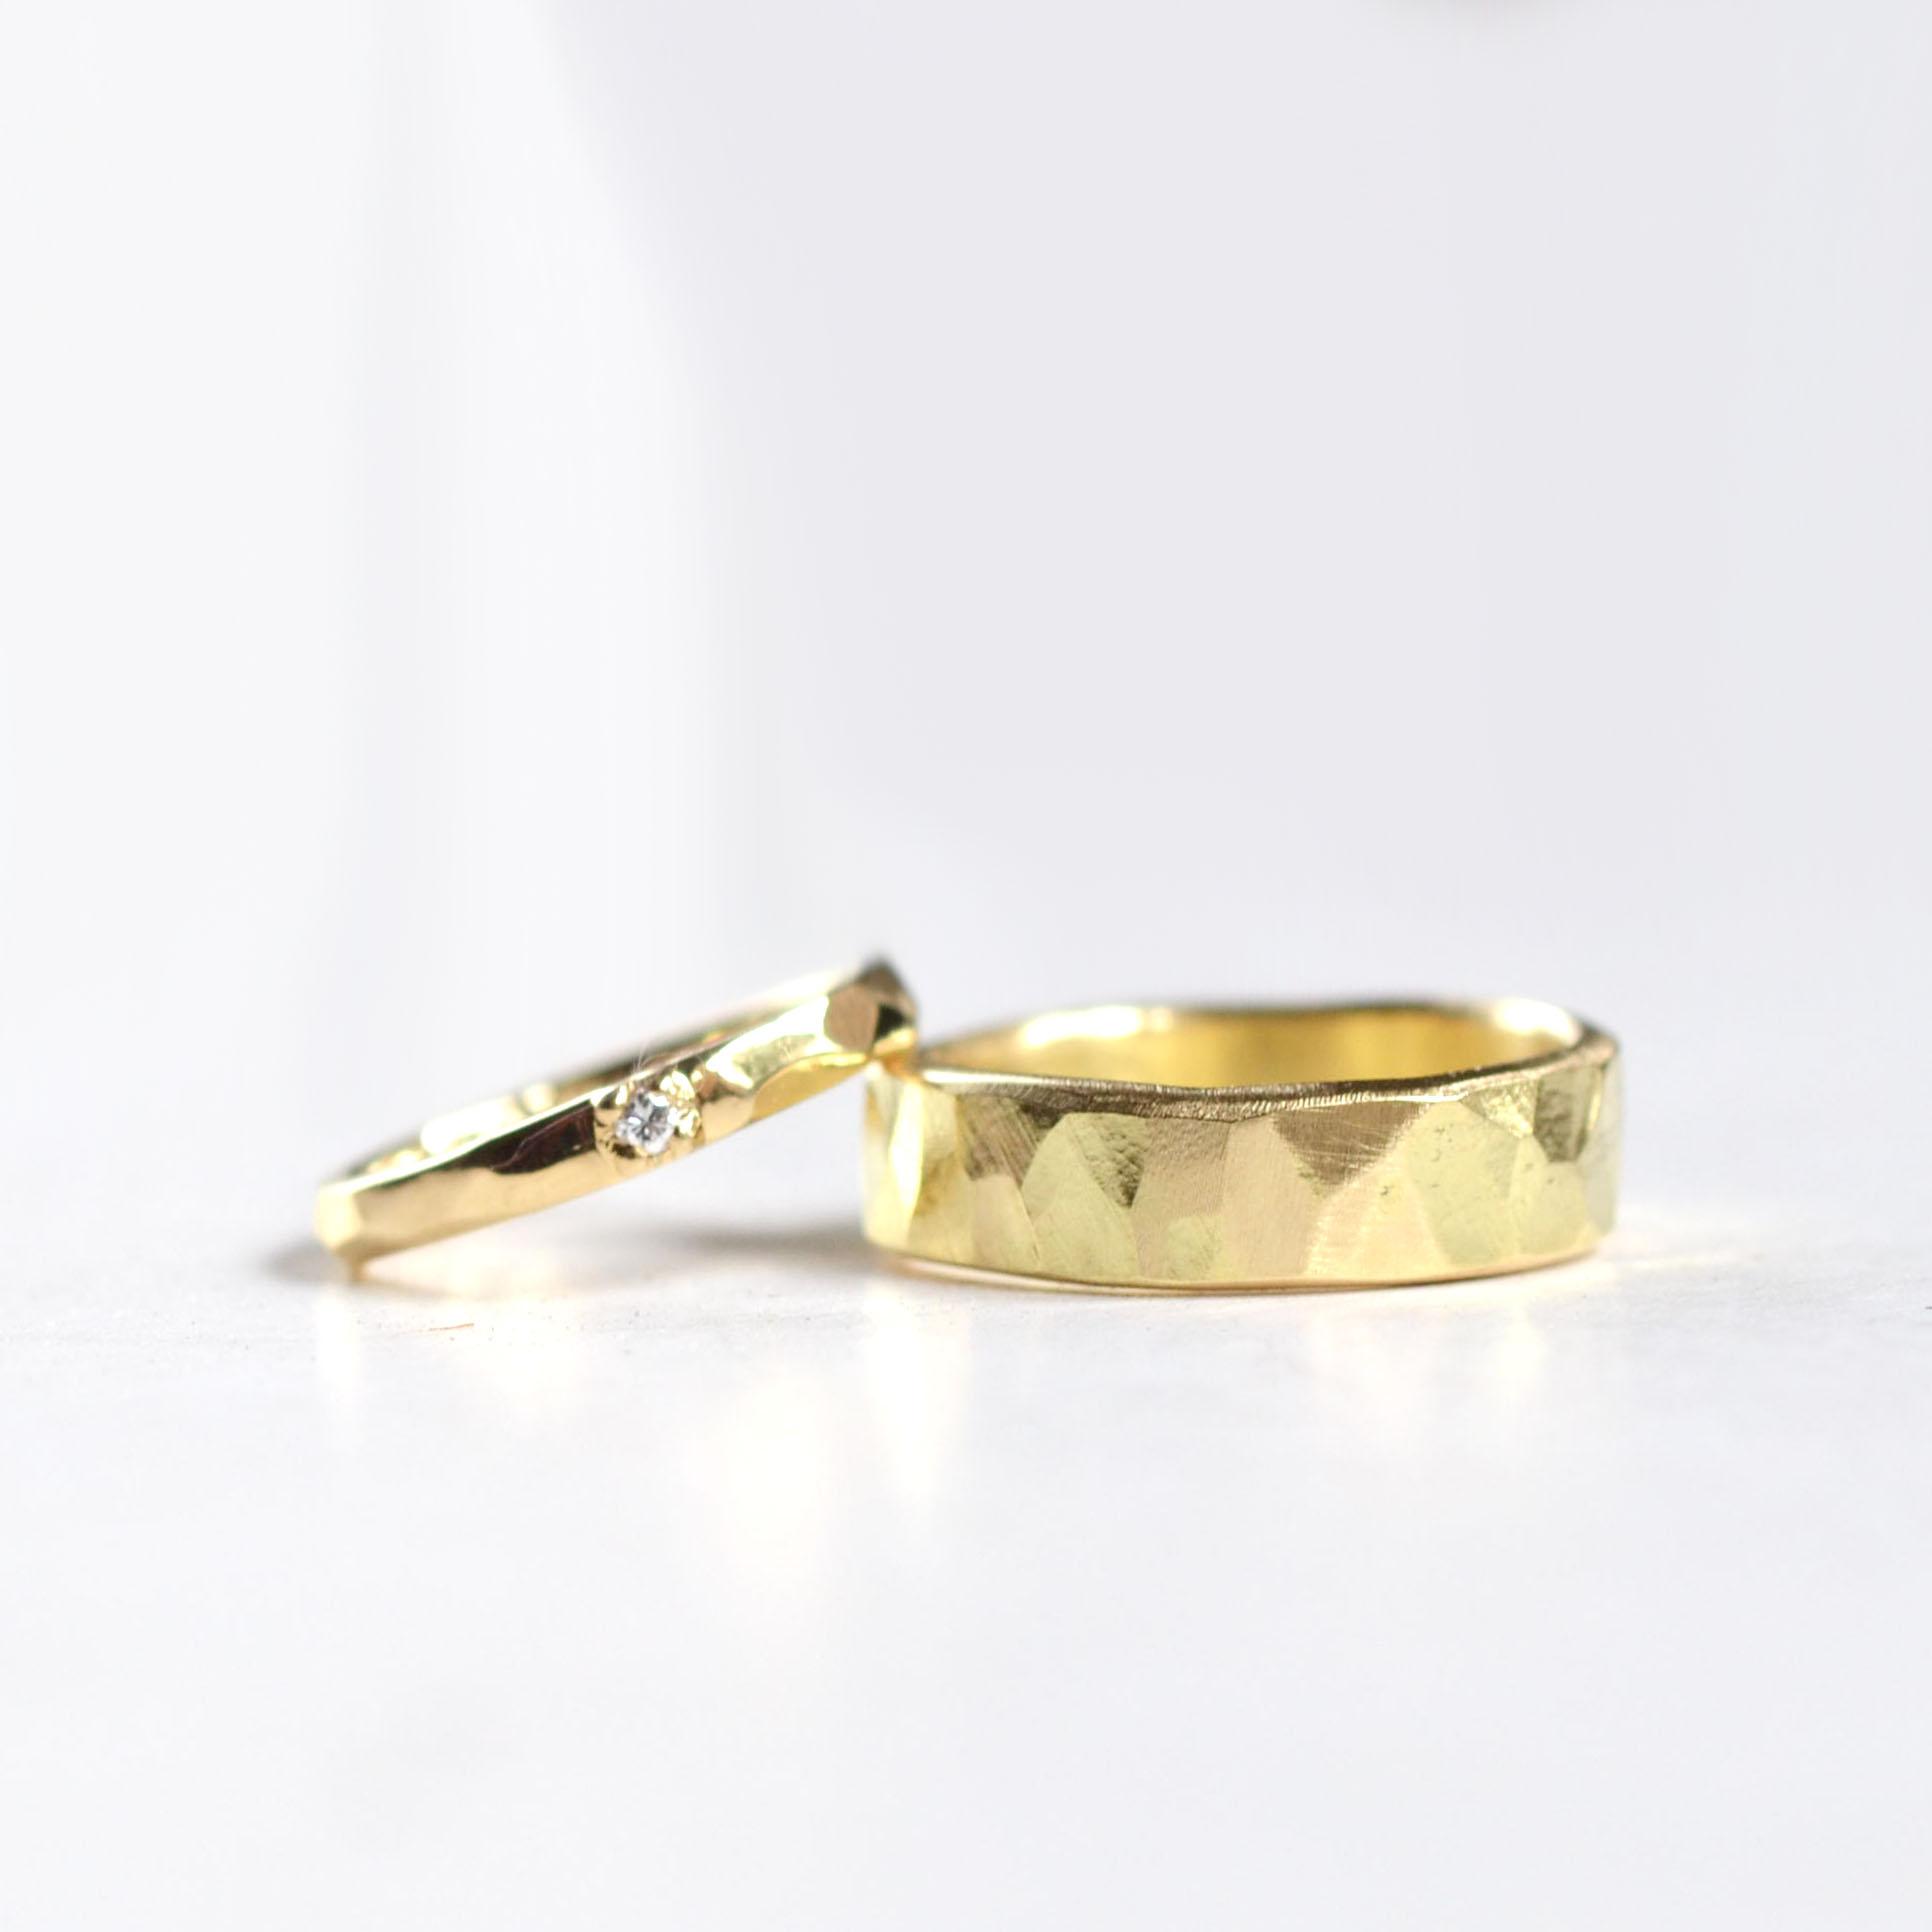 gehamerde trouwringen geel goud met diamant 1.psd.jpg